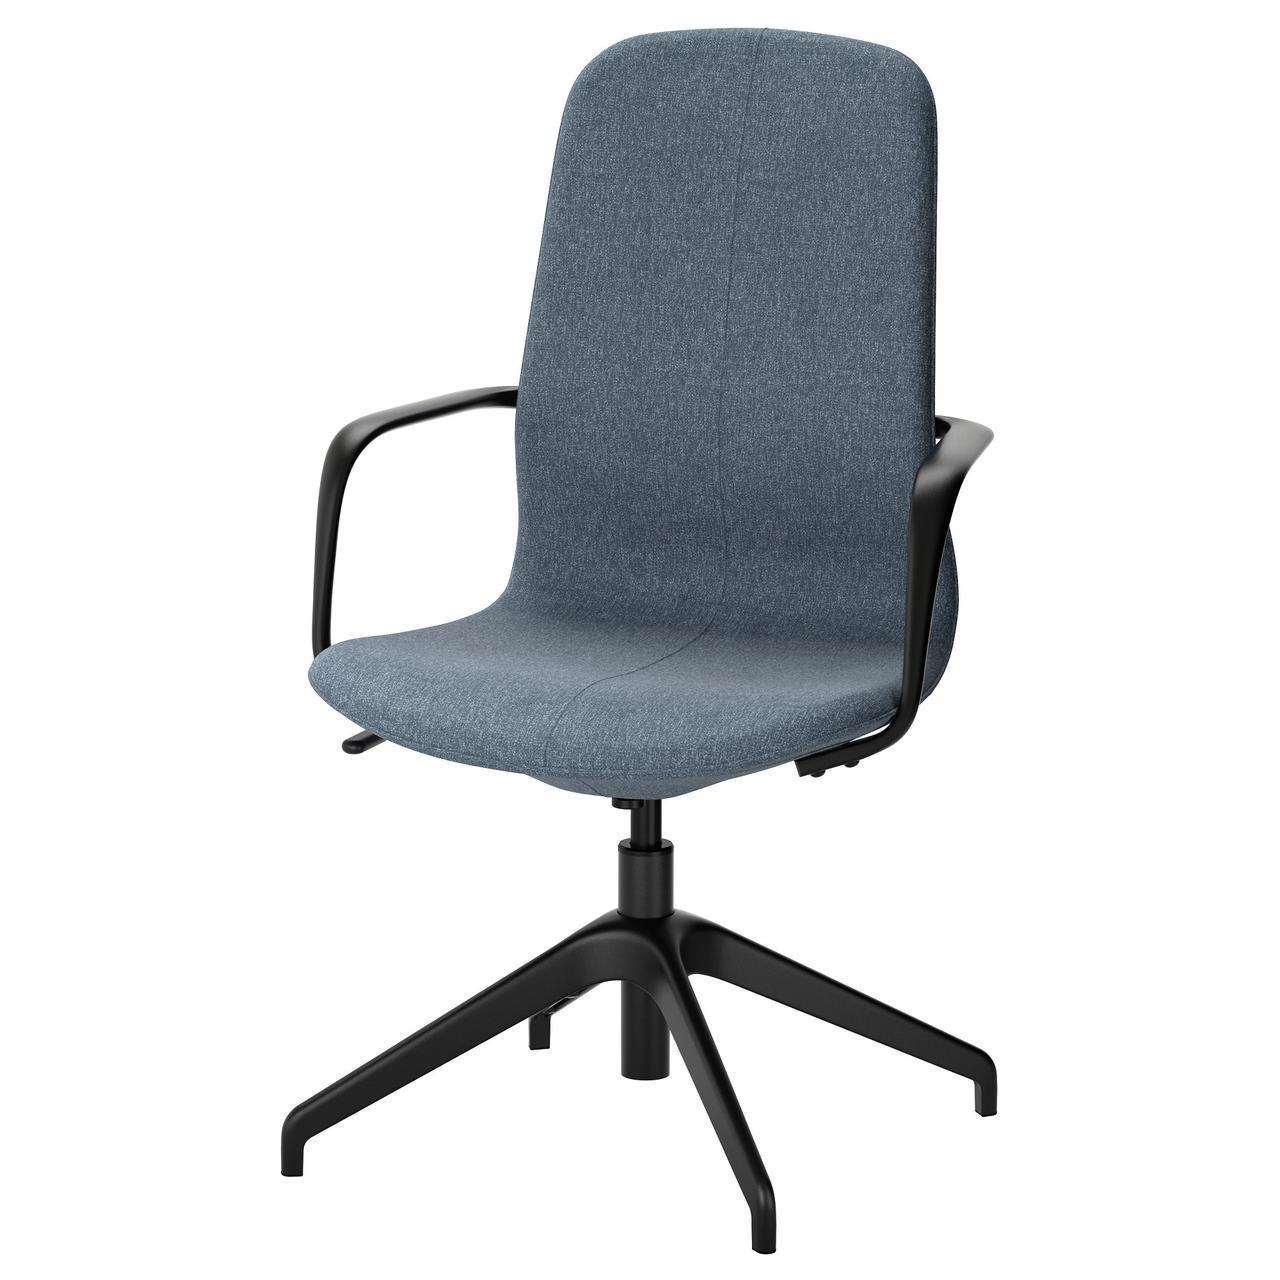 Комп'ютерне крісло IKEA LÅNGFJÄLL Gunnared блакитне чорне 691.763.65